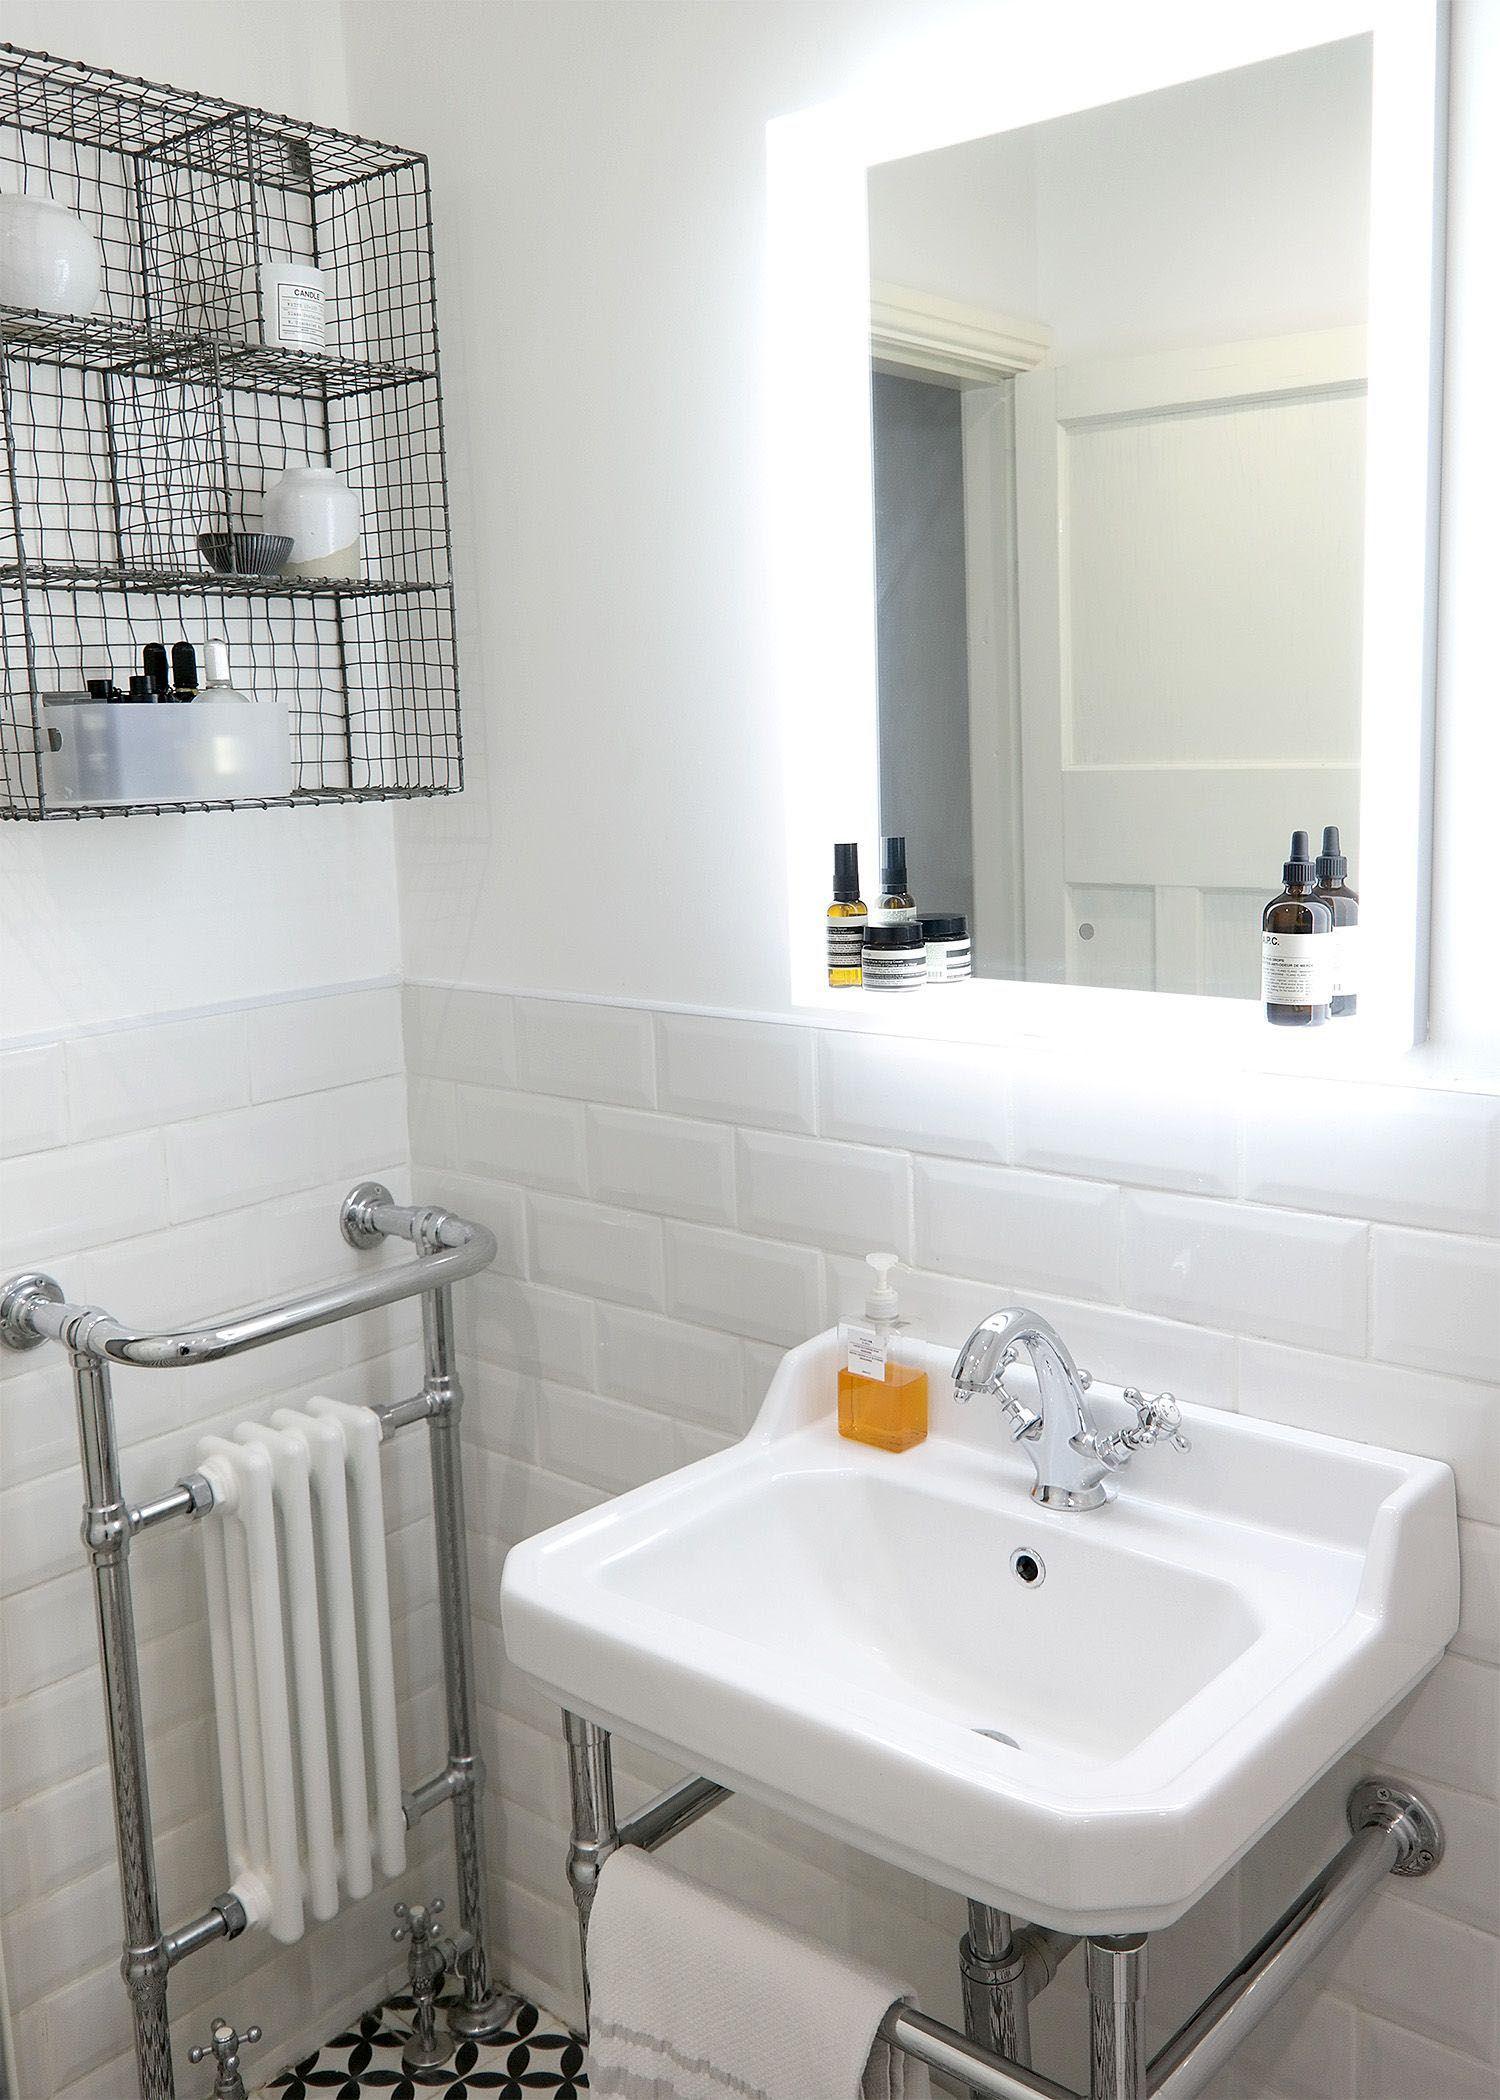 Superb Bathroom Corner Wall Cabinets Uk Exclusive On Homesaholic Com Exclusivebathroomsuk Bathroom Ideas White Walls Trendy Bathroom Tiles